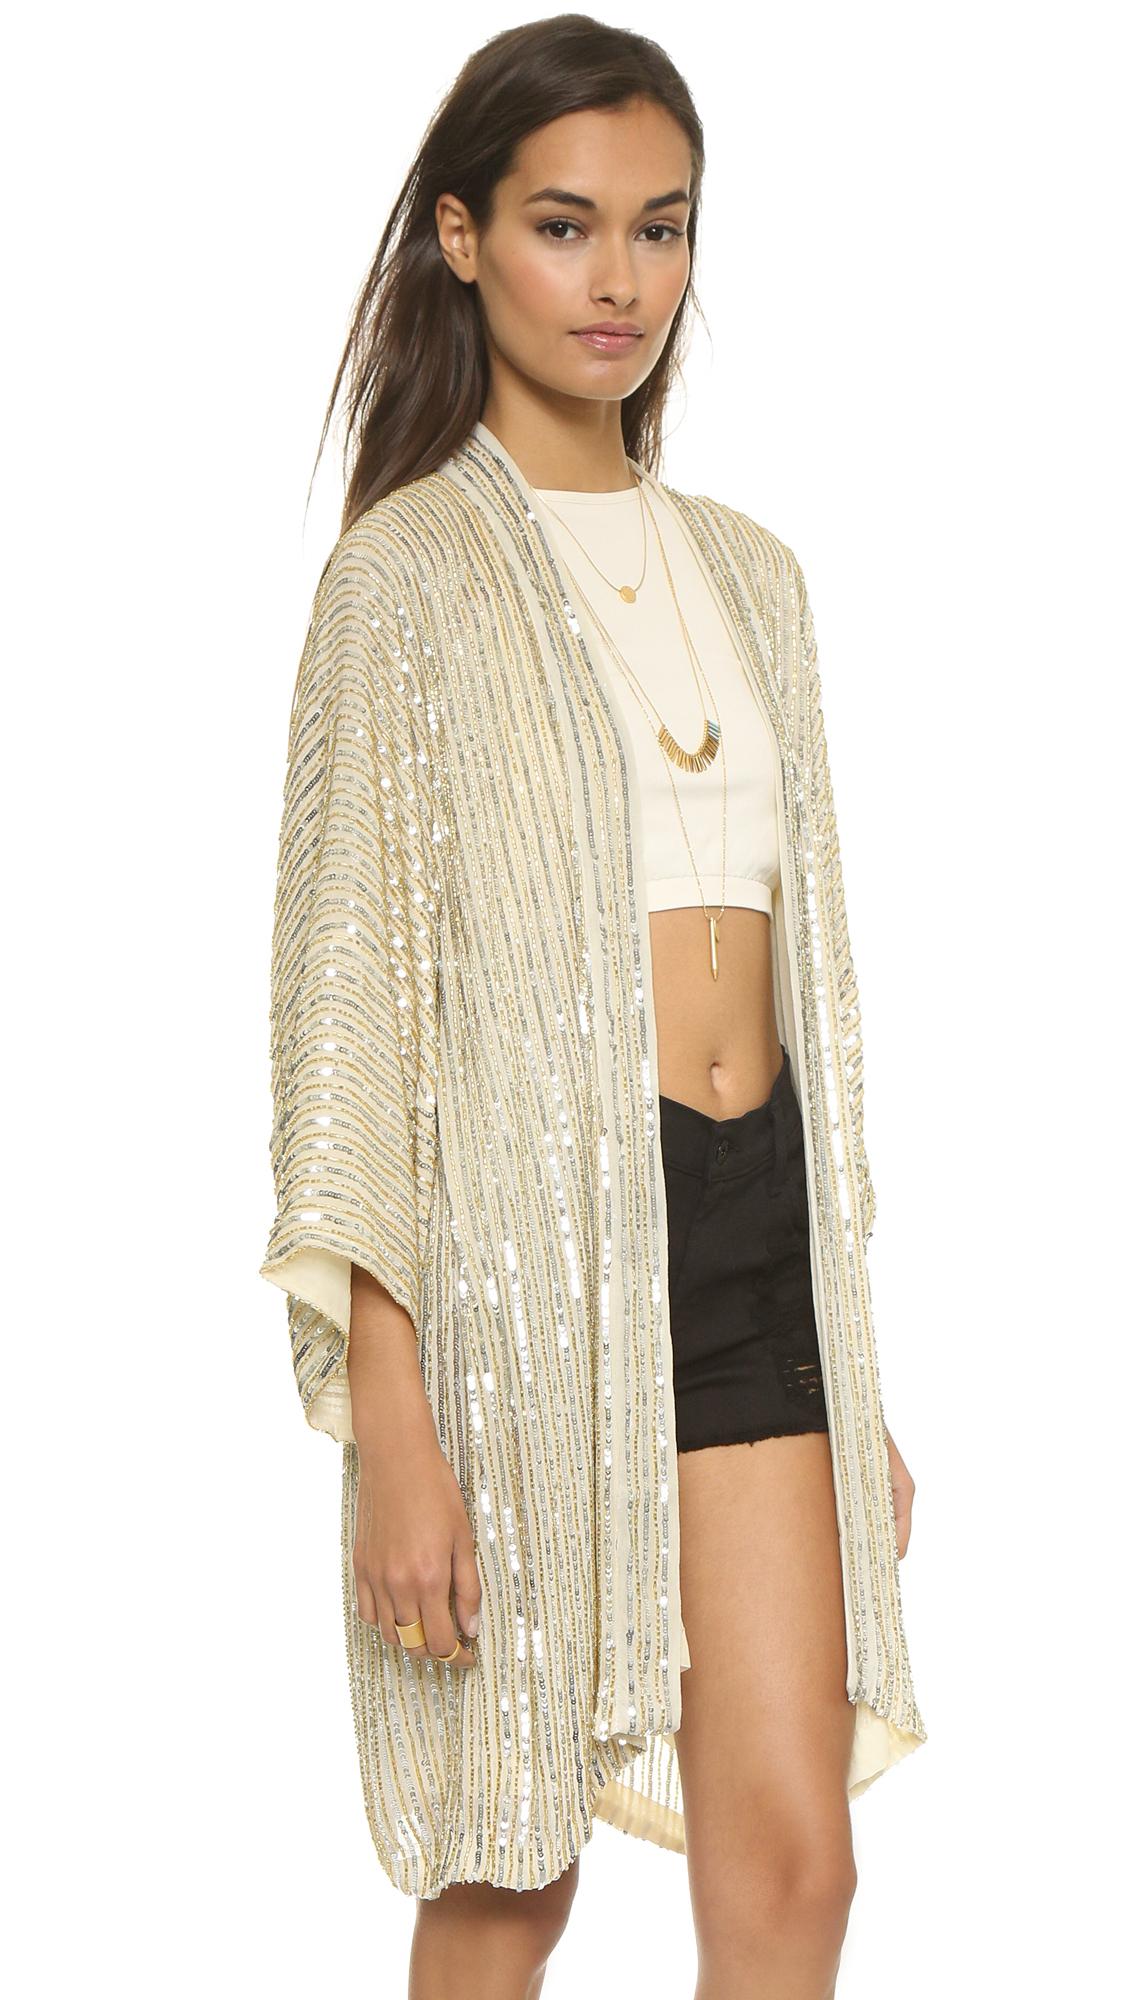 Ganni Summer Sequins Kimono - Gold/Silver in Metallic | Lyst